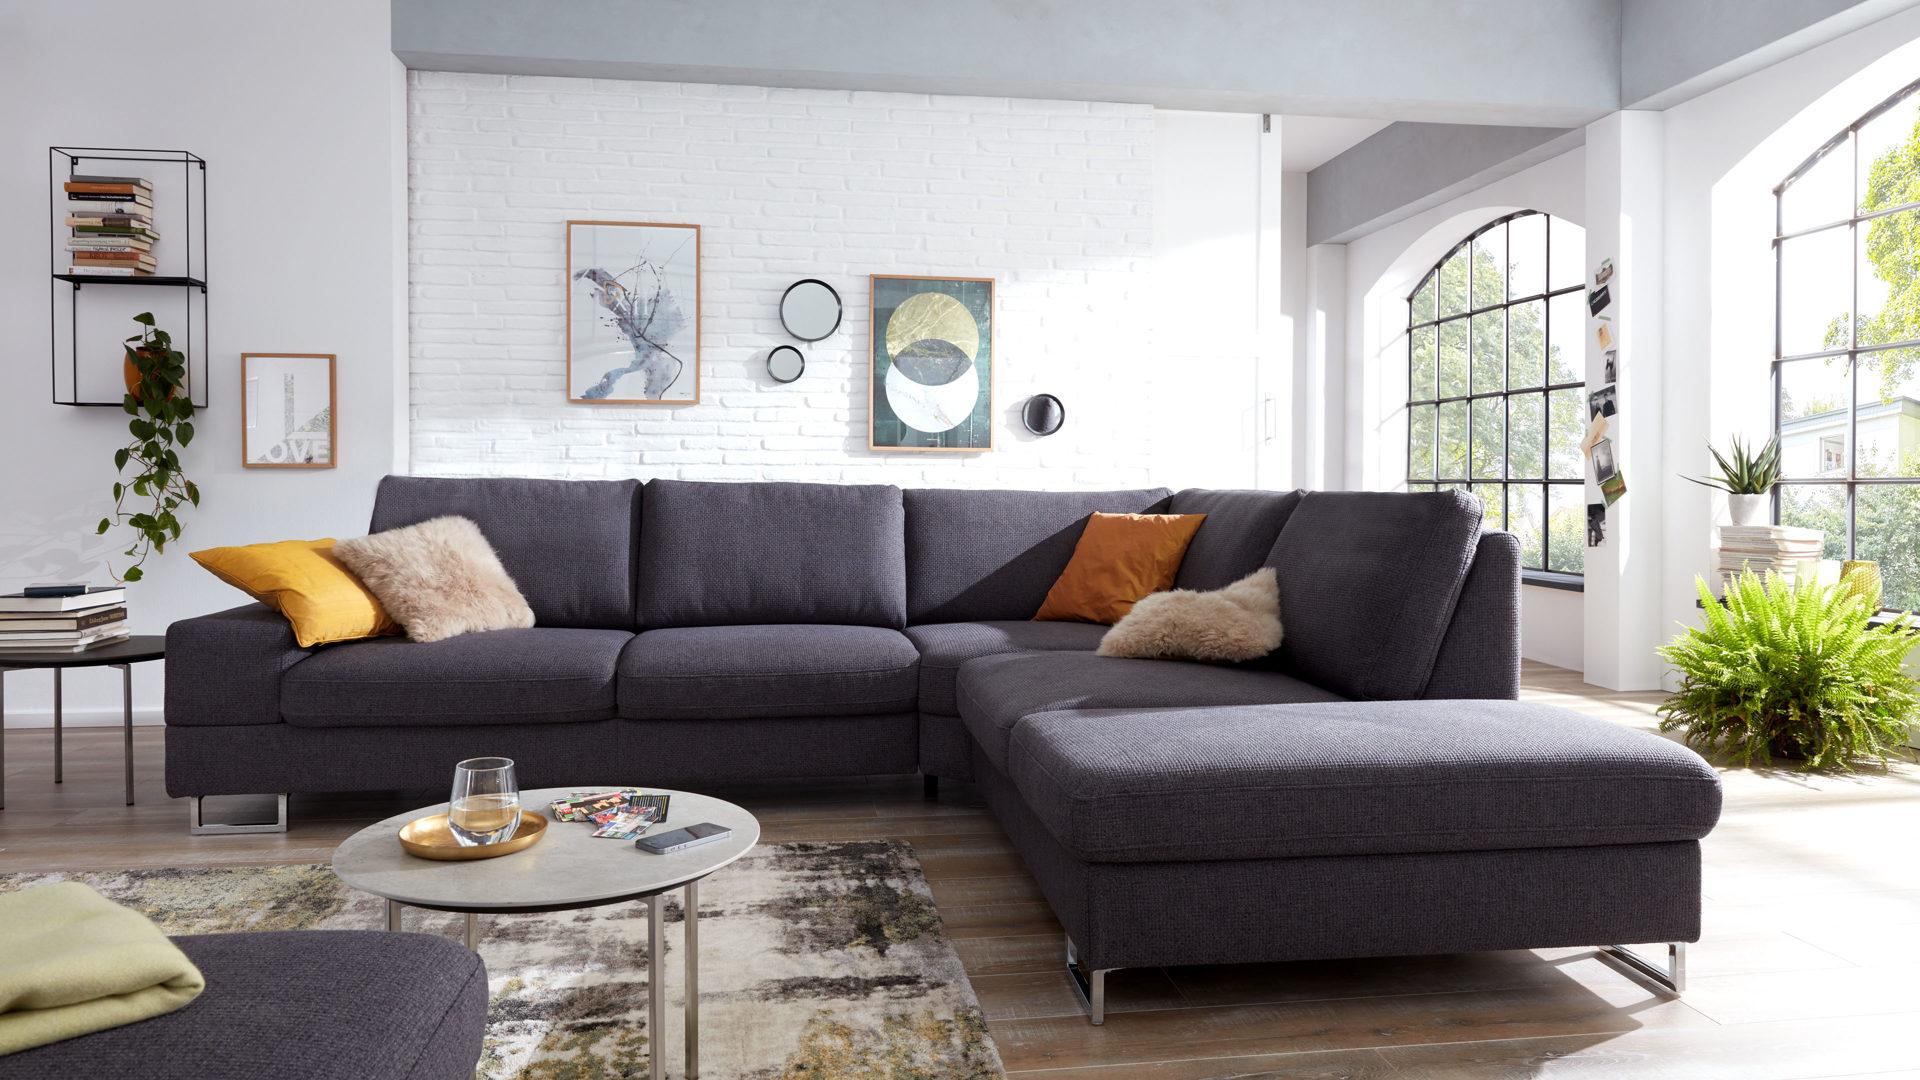 interliving sofa serie 4302 eckkombination